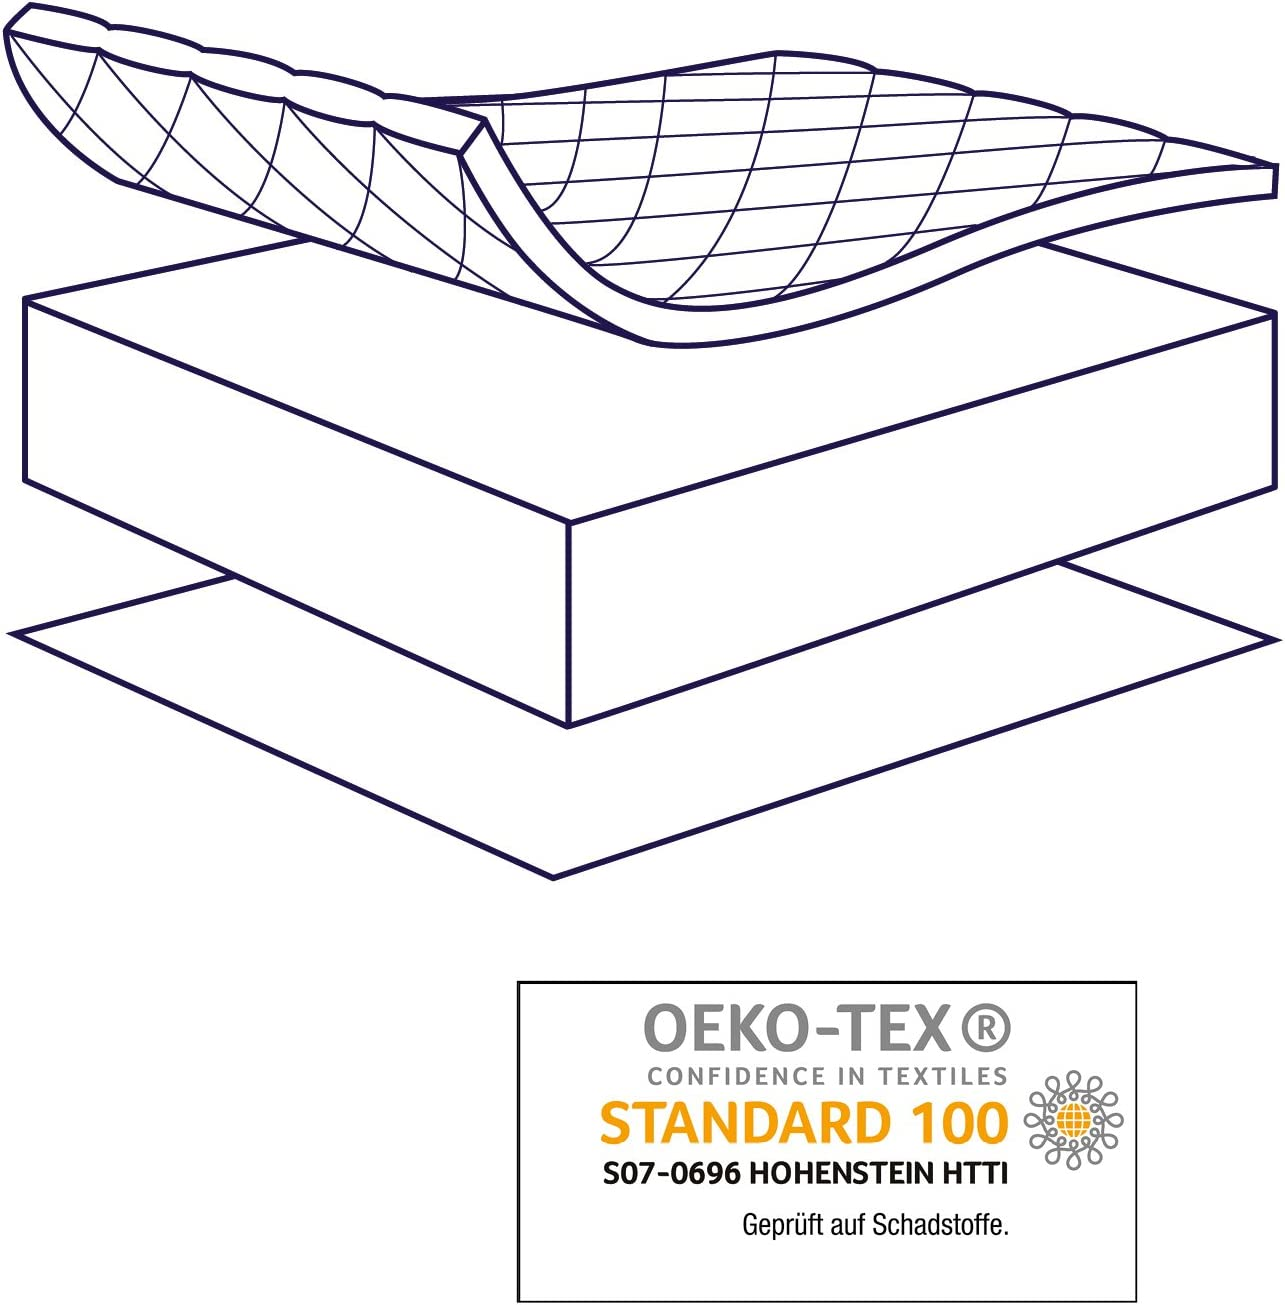 Importado de Alemania 82 x 47 cm Z/öllner 1810082470 XL Allegro Colch/ón para cuna